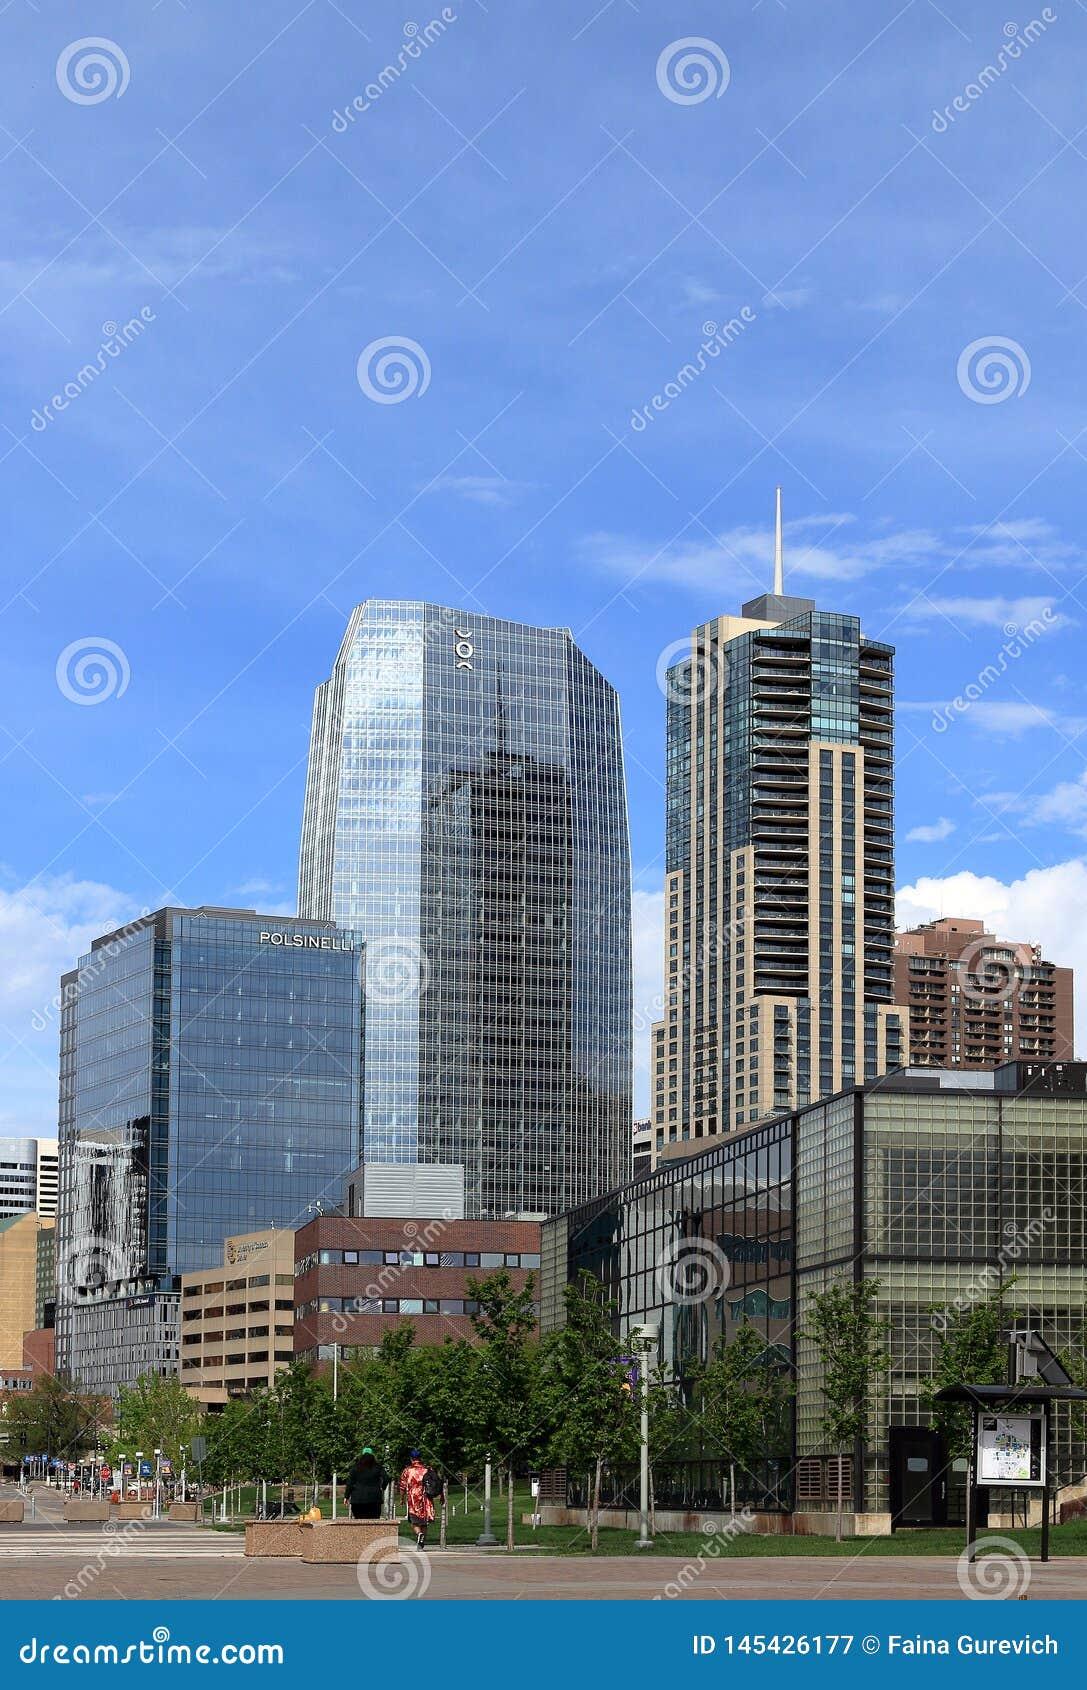 Downtown Denver, Colorado, cityscape on a sunny day